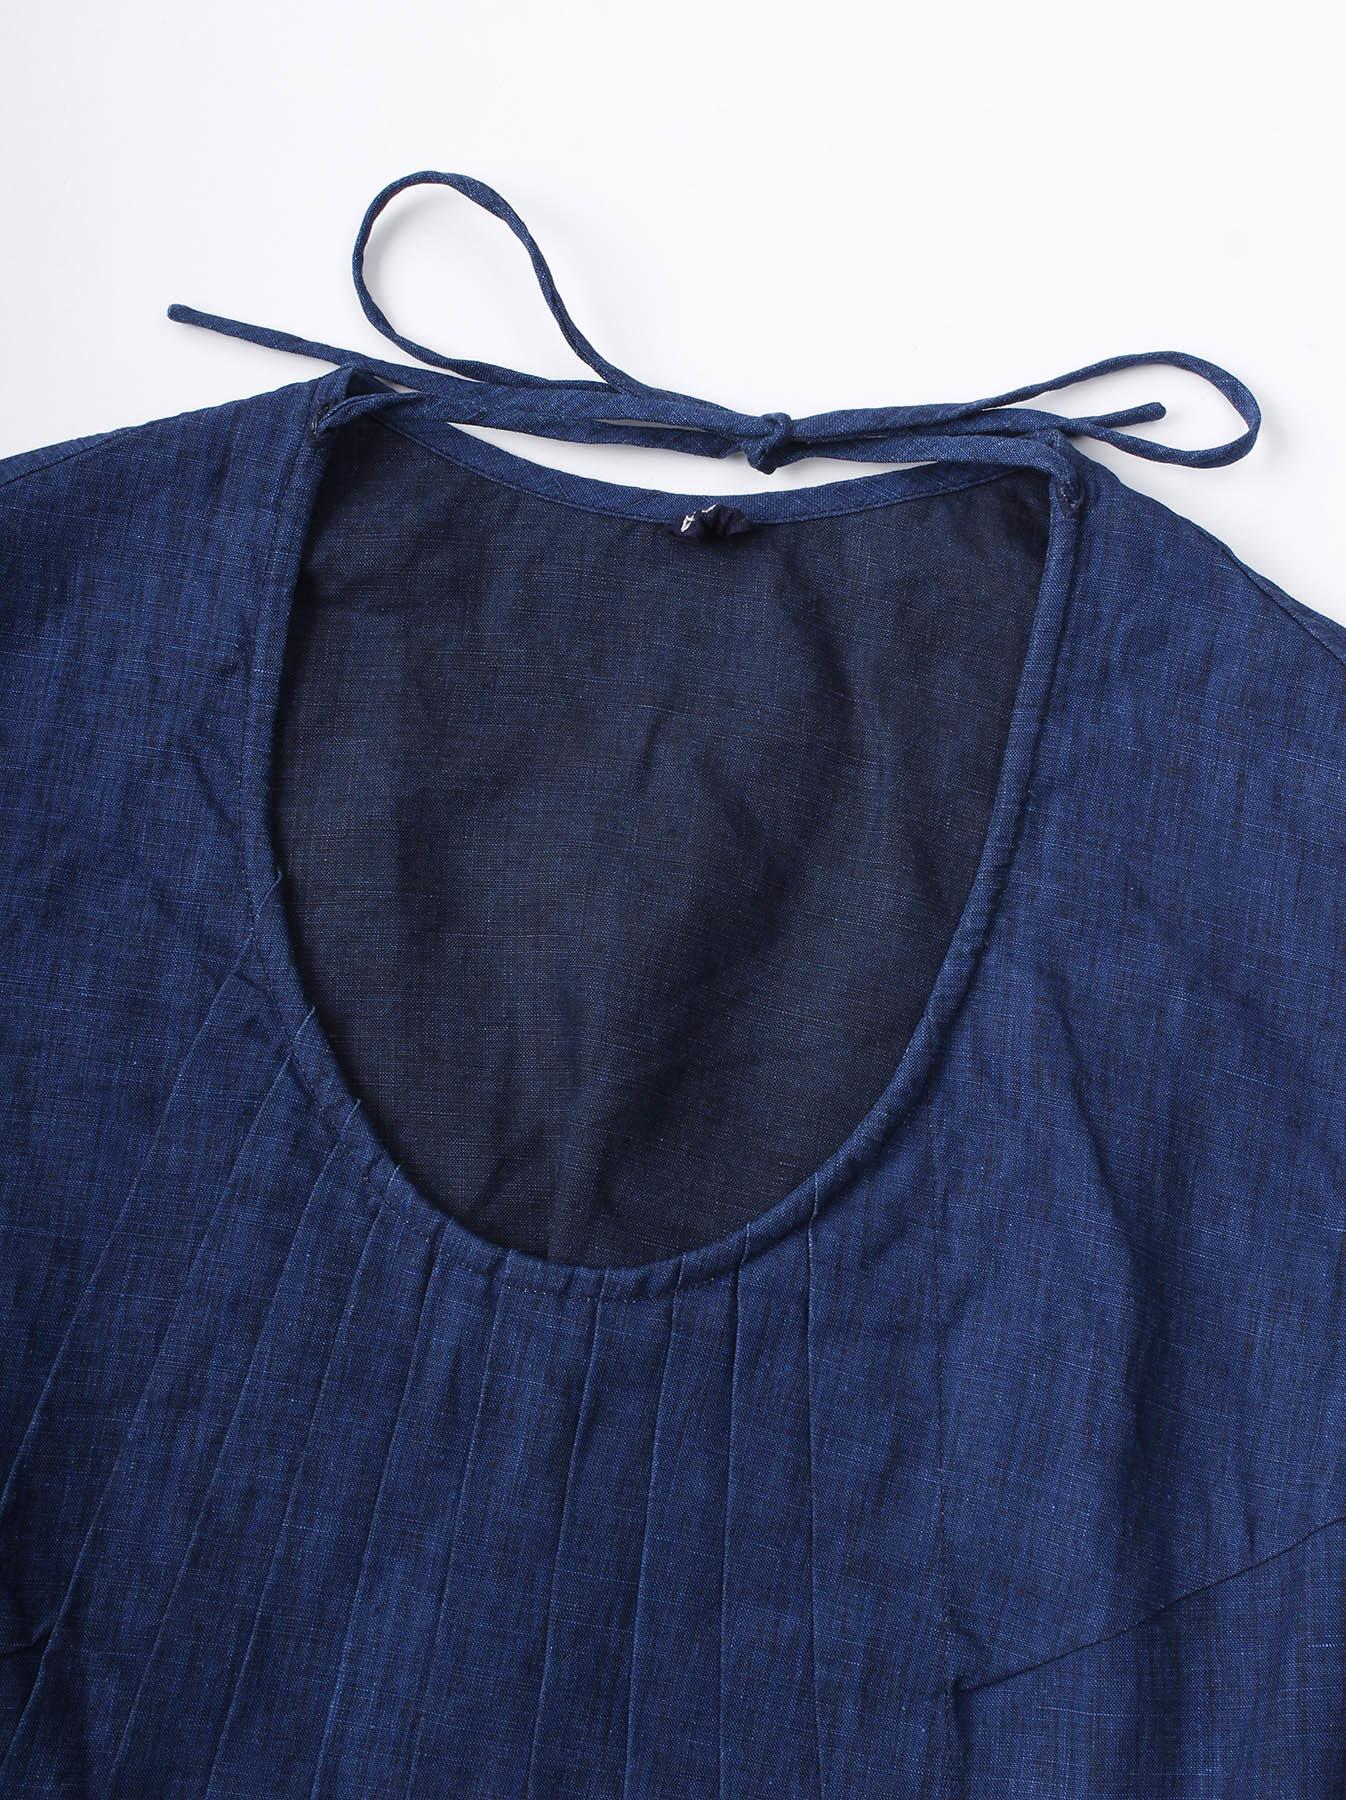 WH Indigo Linen Sleeveless Tuck Blouse-11